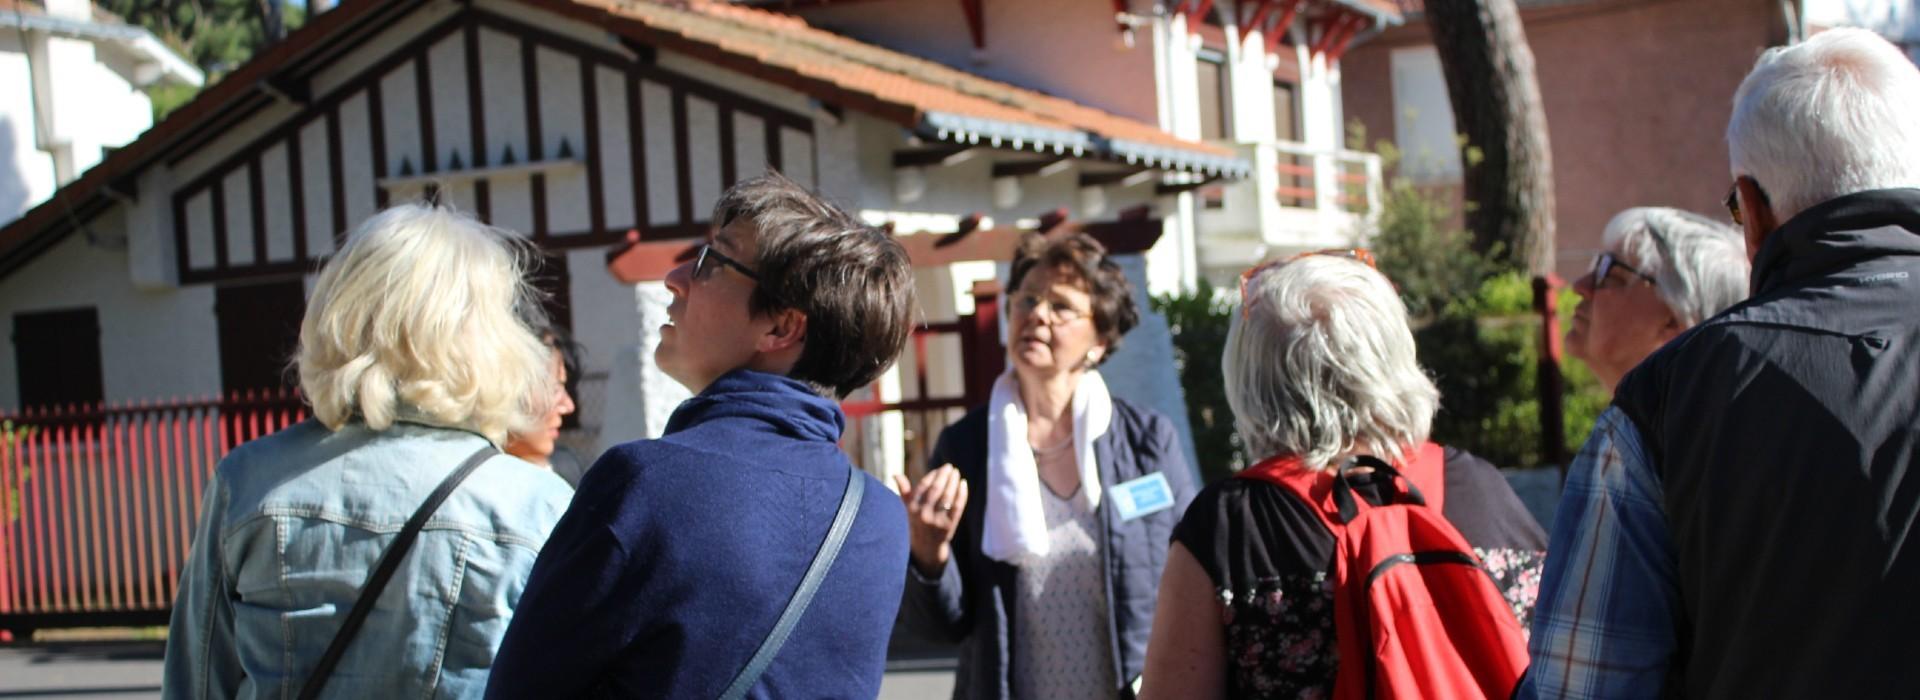 Devenir Greeter - Office de Tourisme La Baule Guérande